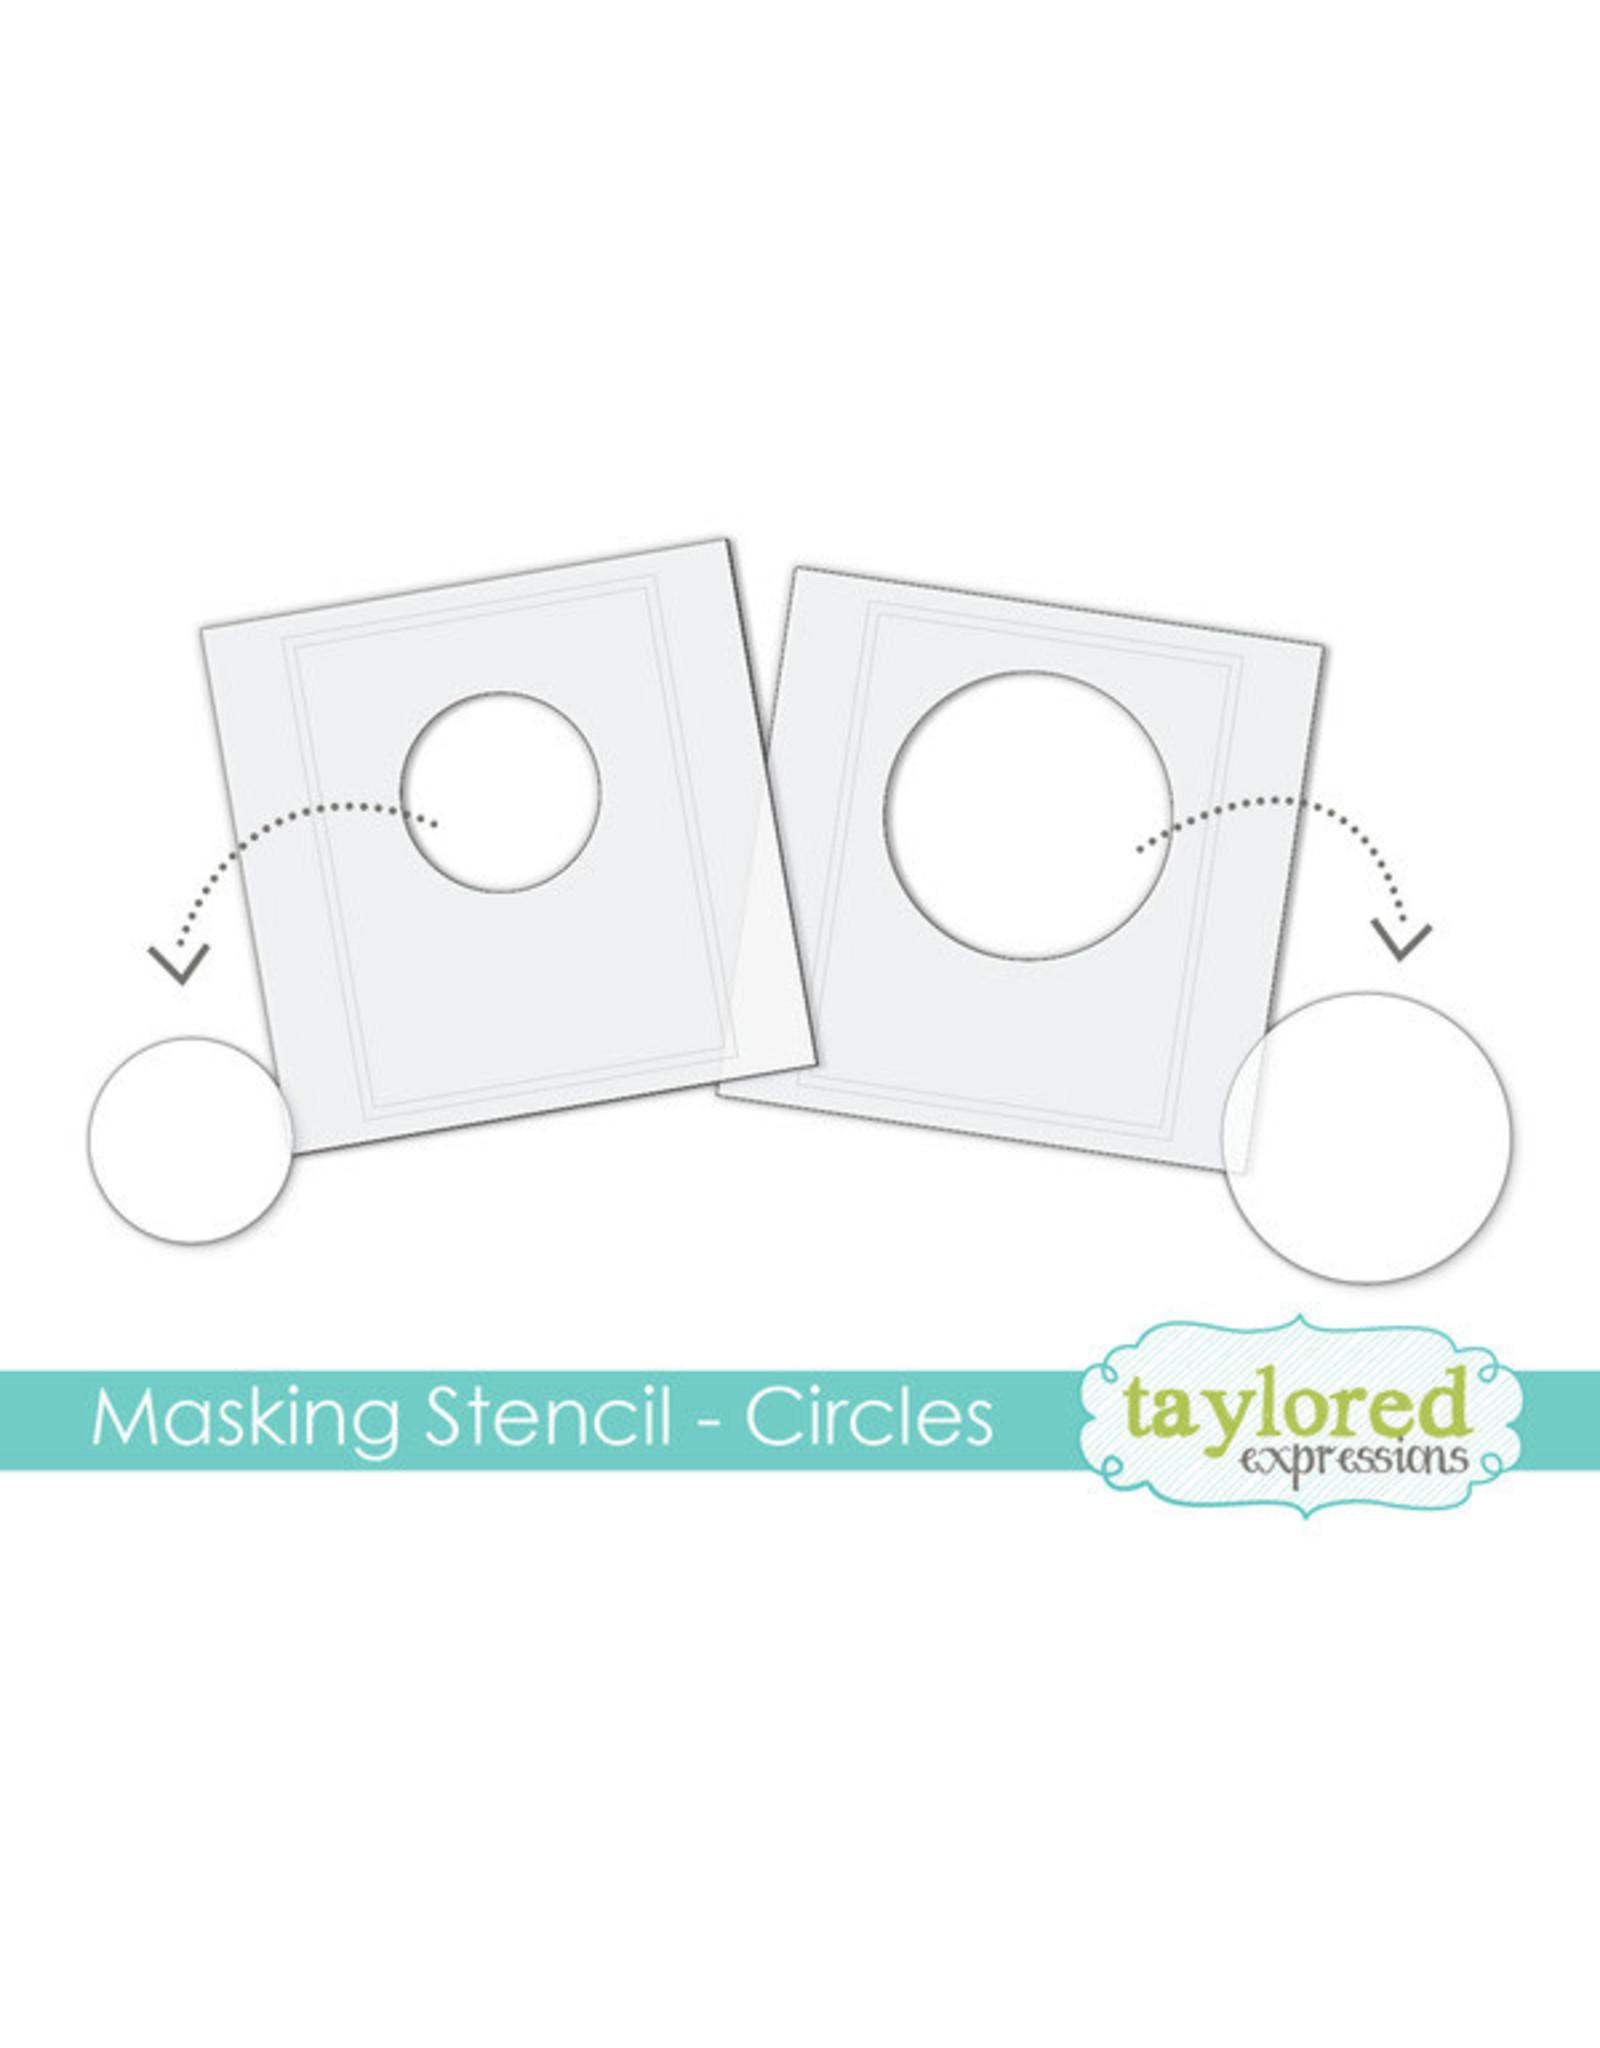 Taylored Expressions Circles - 6x6 Designer Masking Stencil